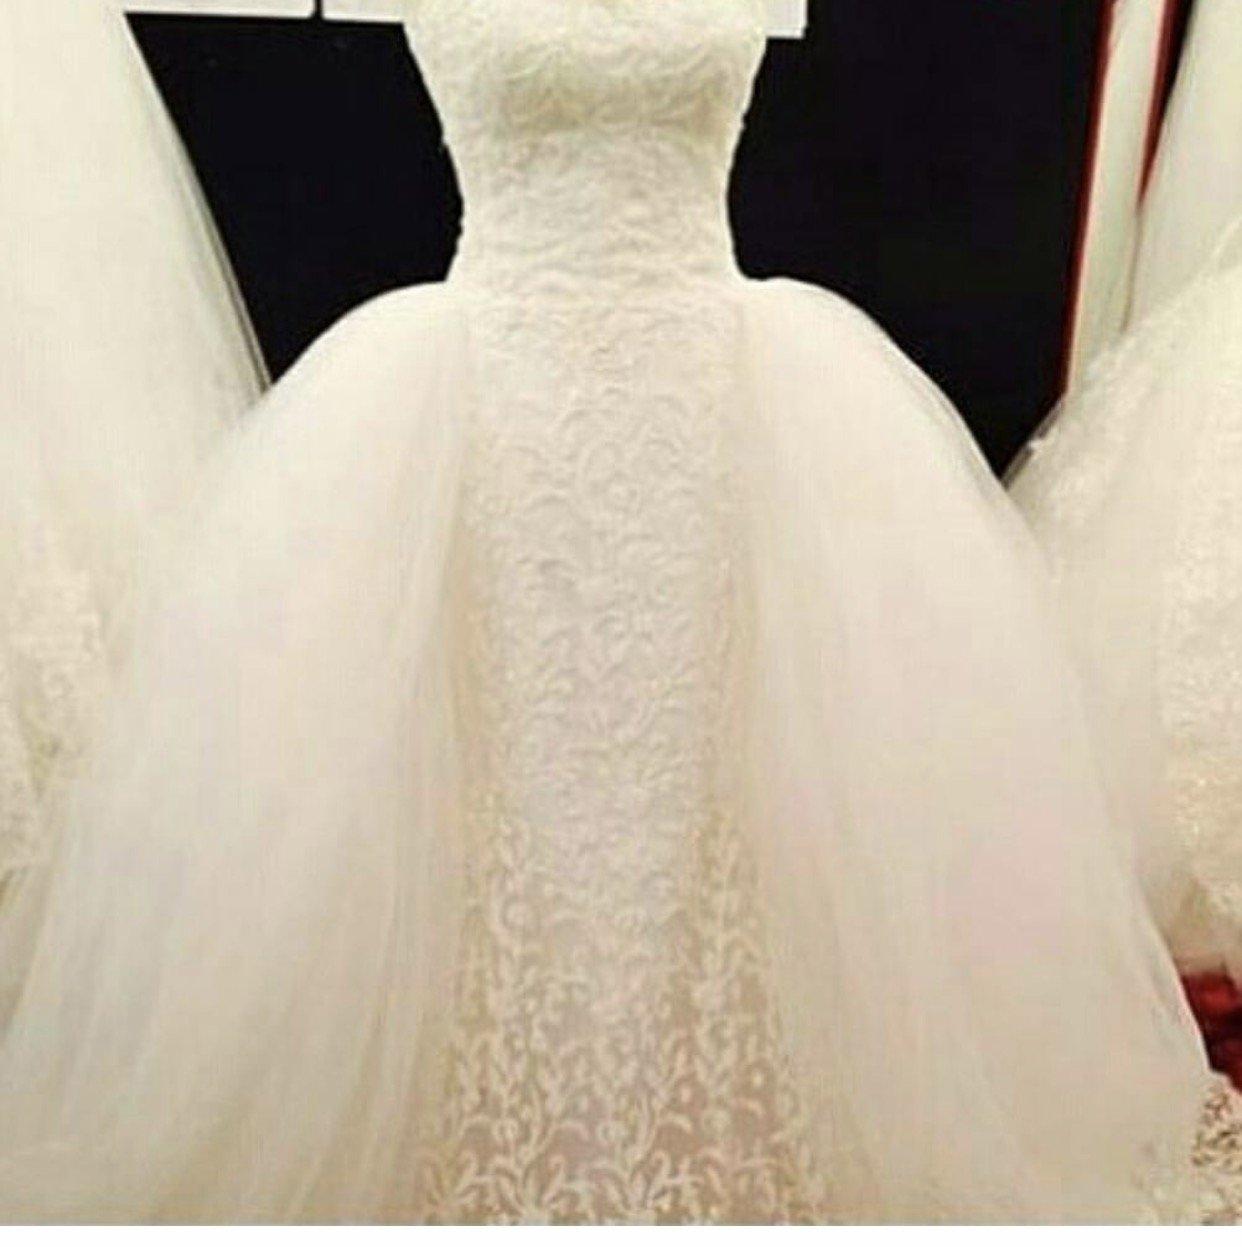 بالصور فساتين زفاف اوف وايت , اجمل صيحات فساتين الزفاف 2019 2713 1